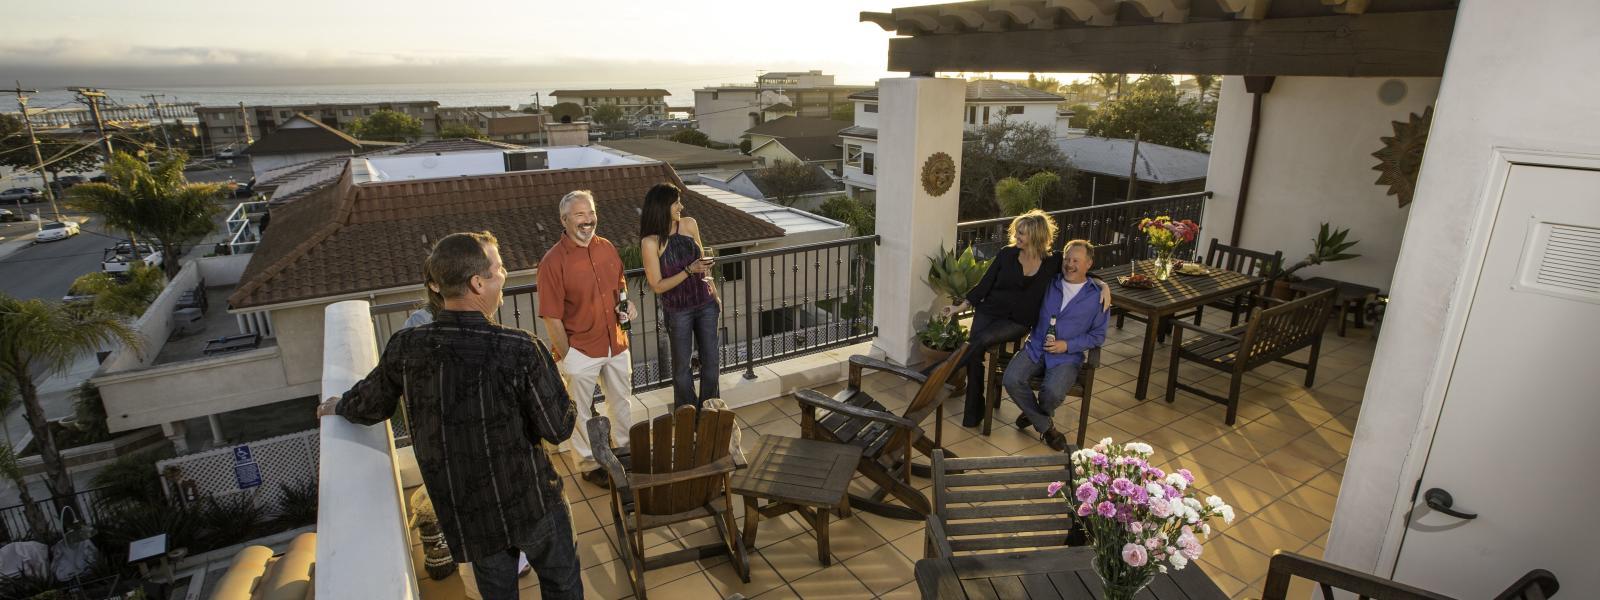 San Luis Obispo County Vacation Rentals | Oceano, Avila Beach